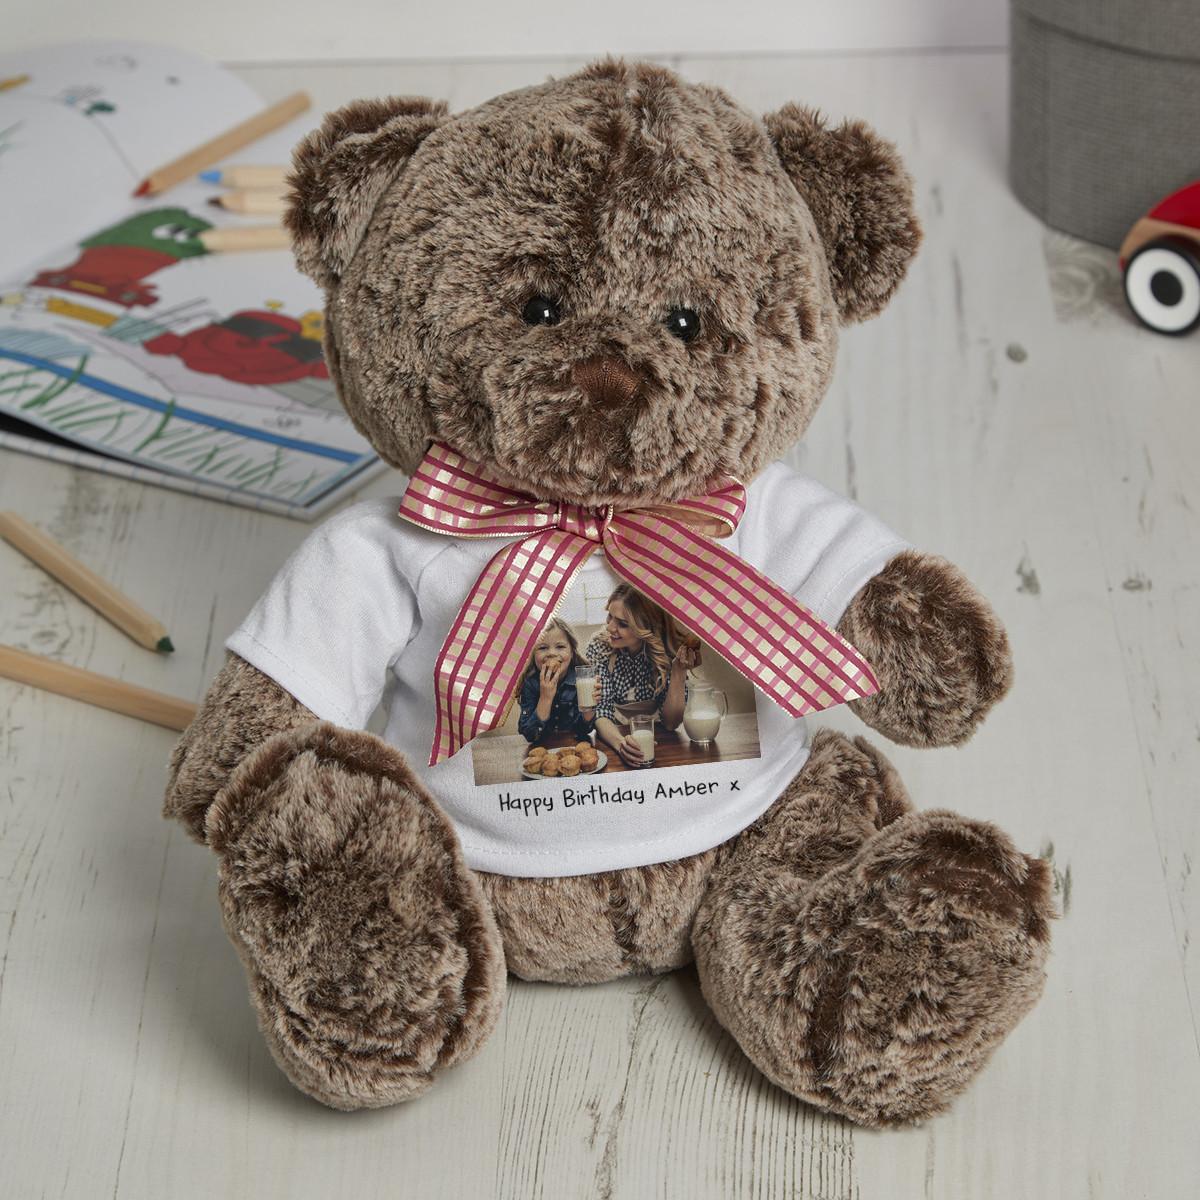 personalised Photo Coco Teddy Bear